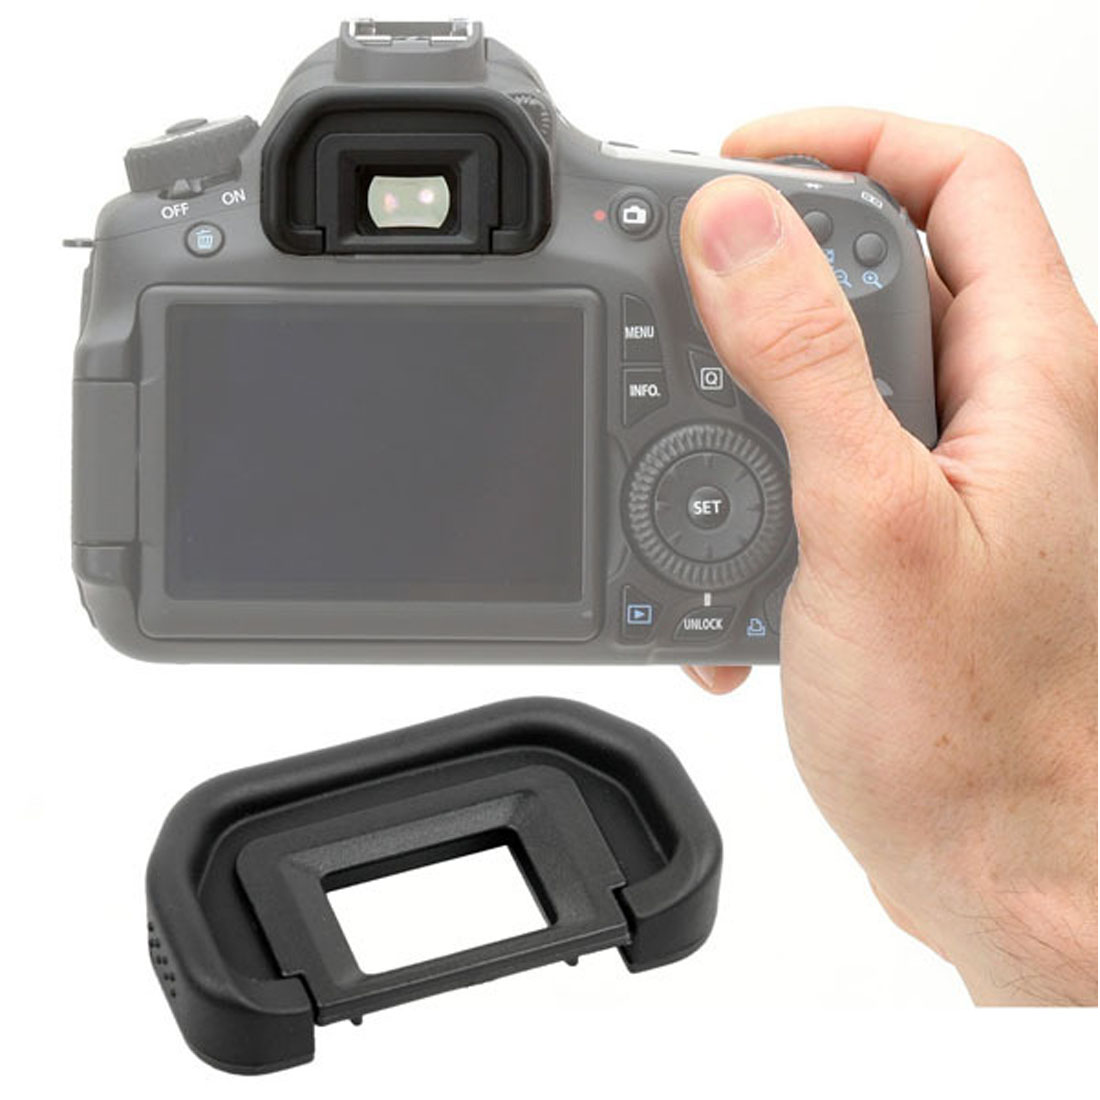 centechia Brand Camera Rubber Eye Cup EyeCup Eyepiece for Canon EOS 60D 50D 5D Mark II 5D2 40D 30D 20D 10D 1100D 1000D jjc eye shape eyepiece soft eyecup for canon eos 5d mark ii 5d 6d mark ii 60d 50d 40d 77d 800d 1300d replaces eyecup eb ef